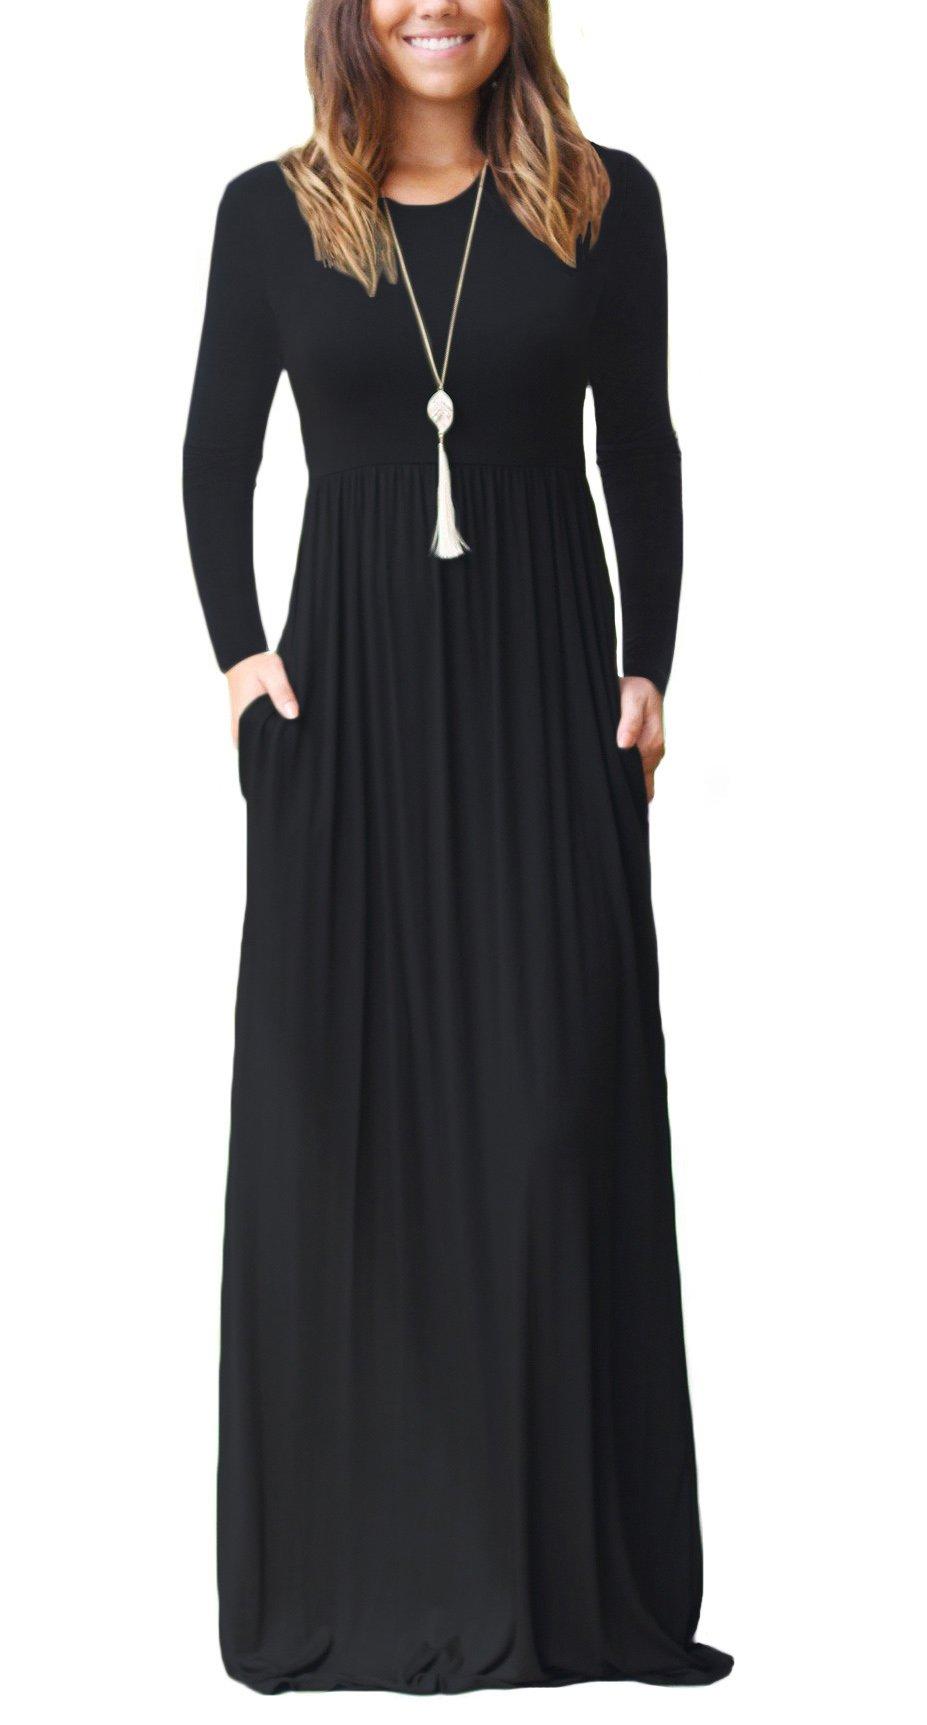 DEARCASE Women Long Sleeve Loose Plain Maxi Dresses Casual Long Dresses with Pockets Black Large